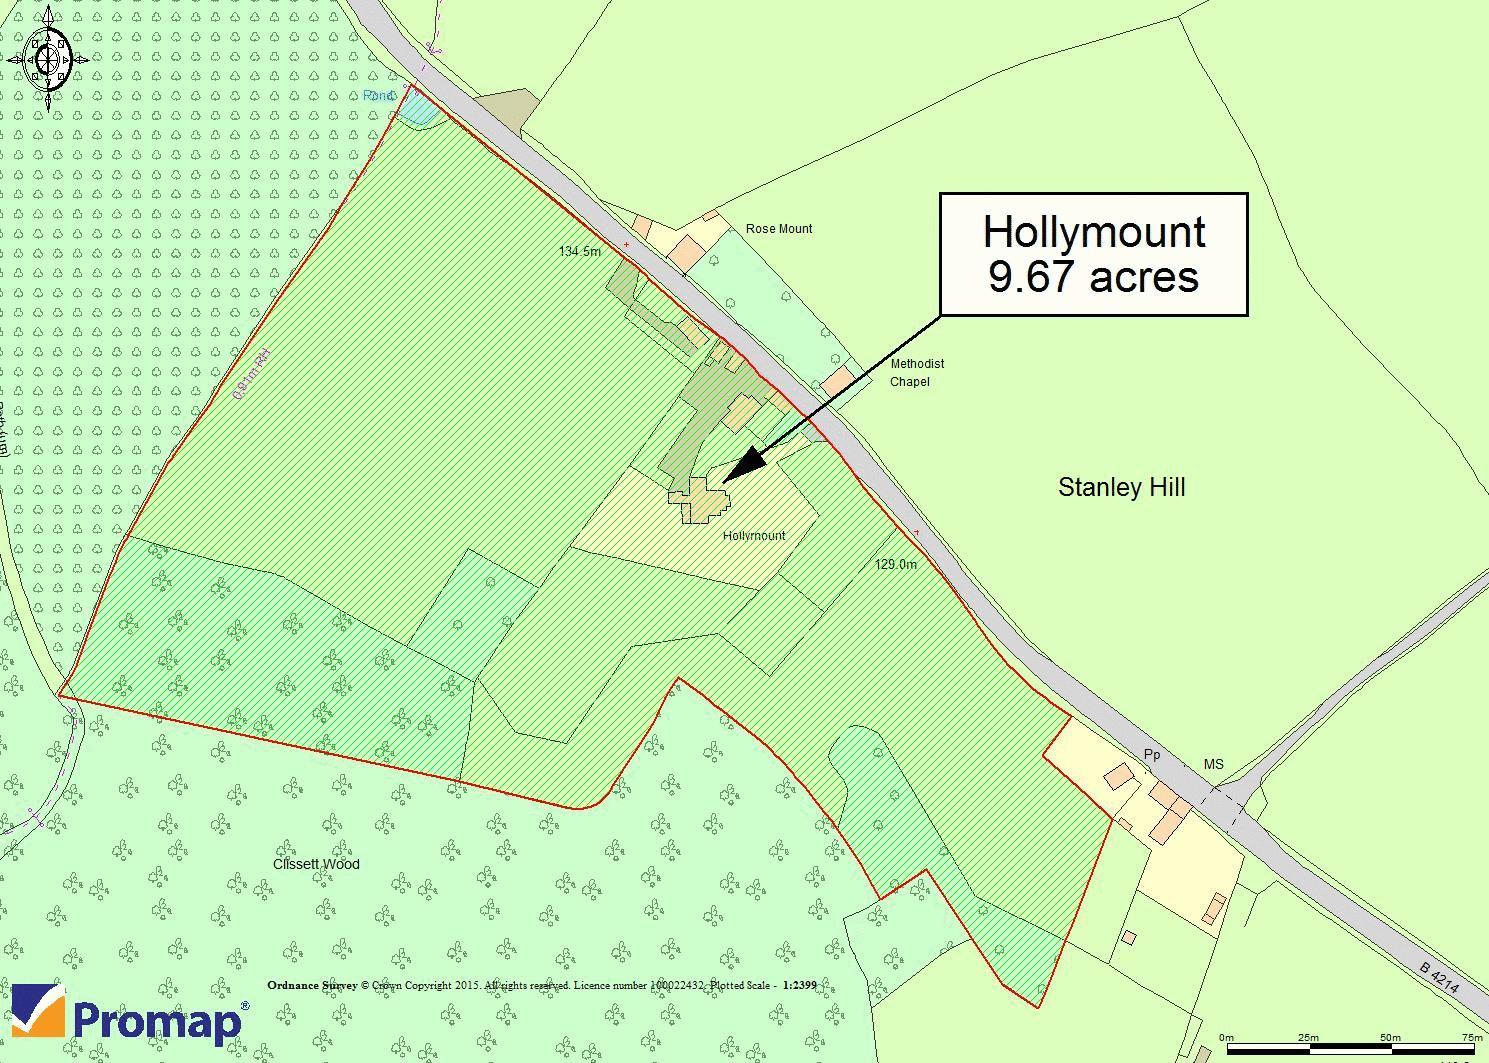 Hollymount Siteplan